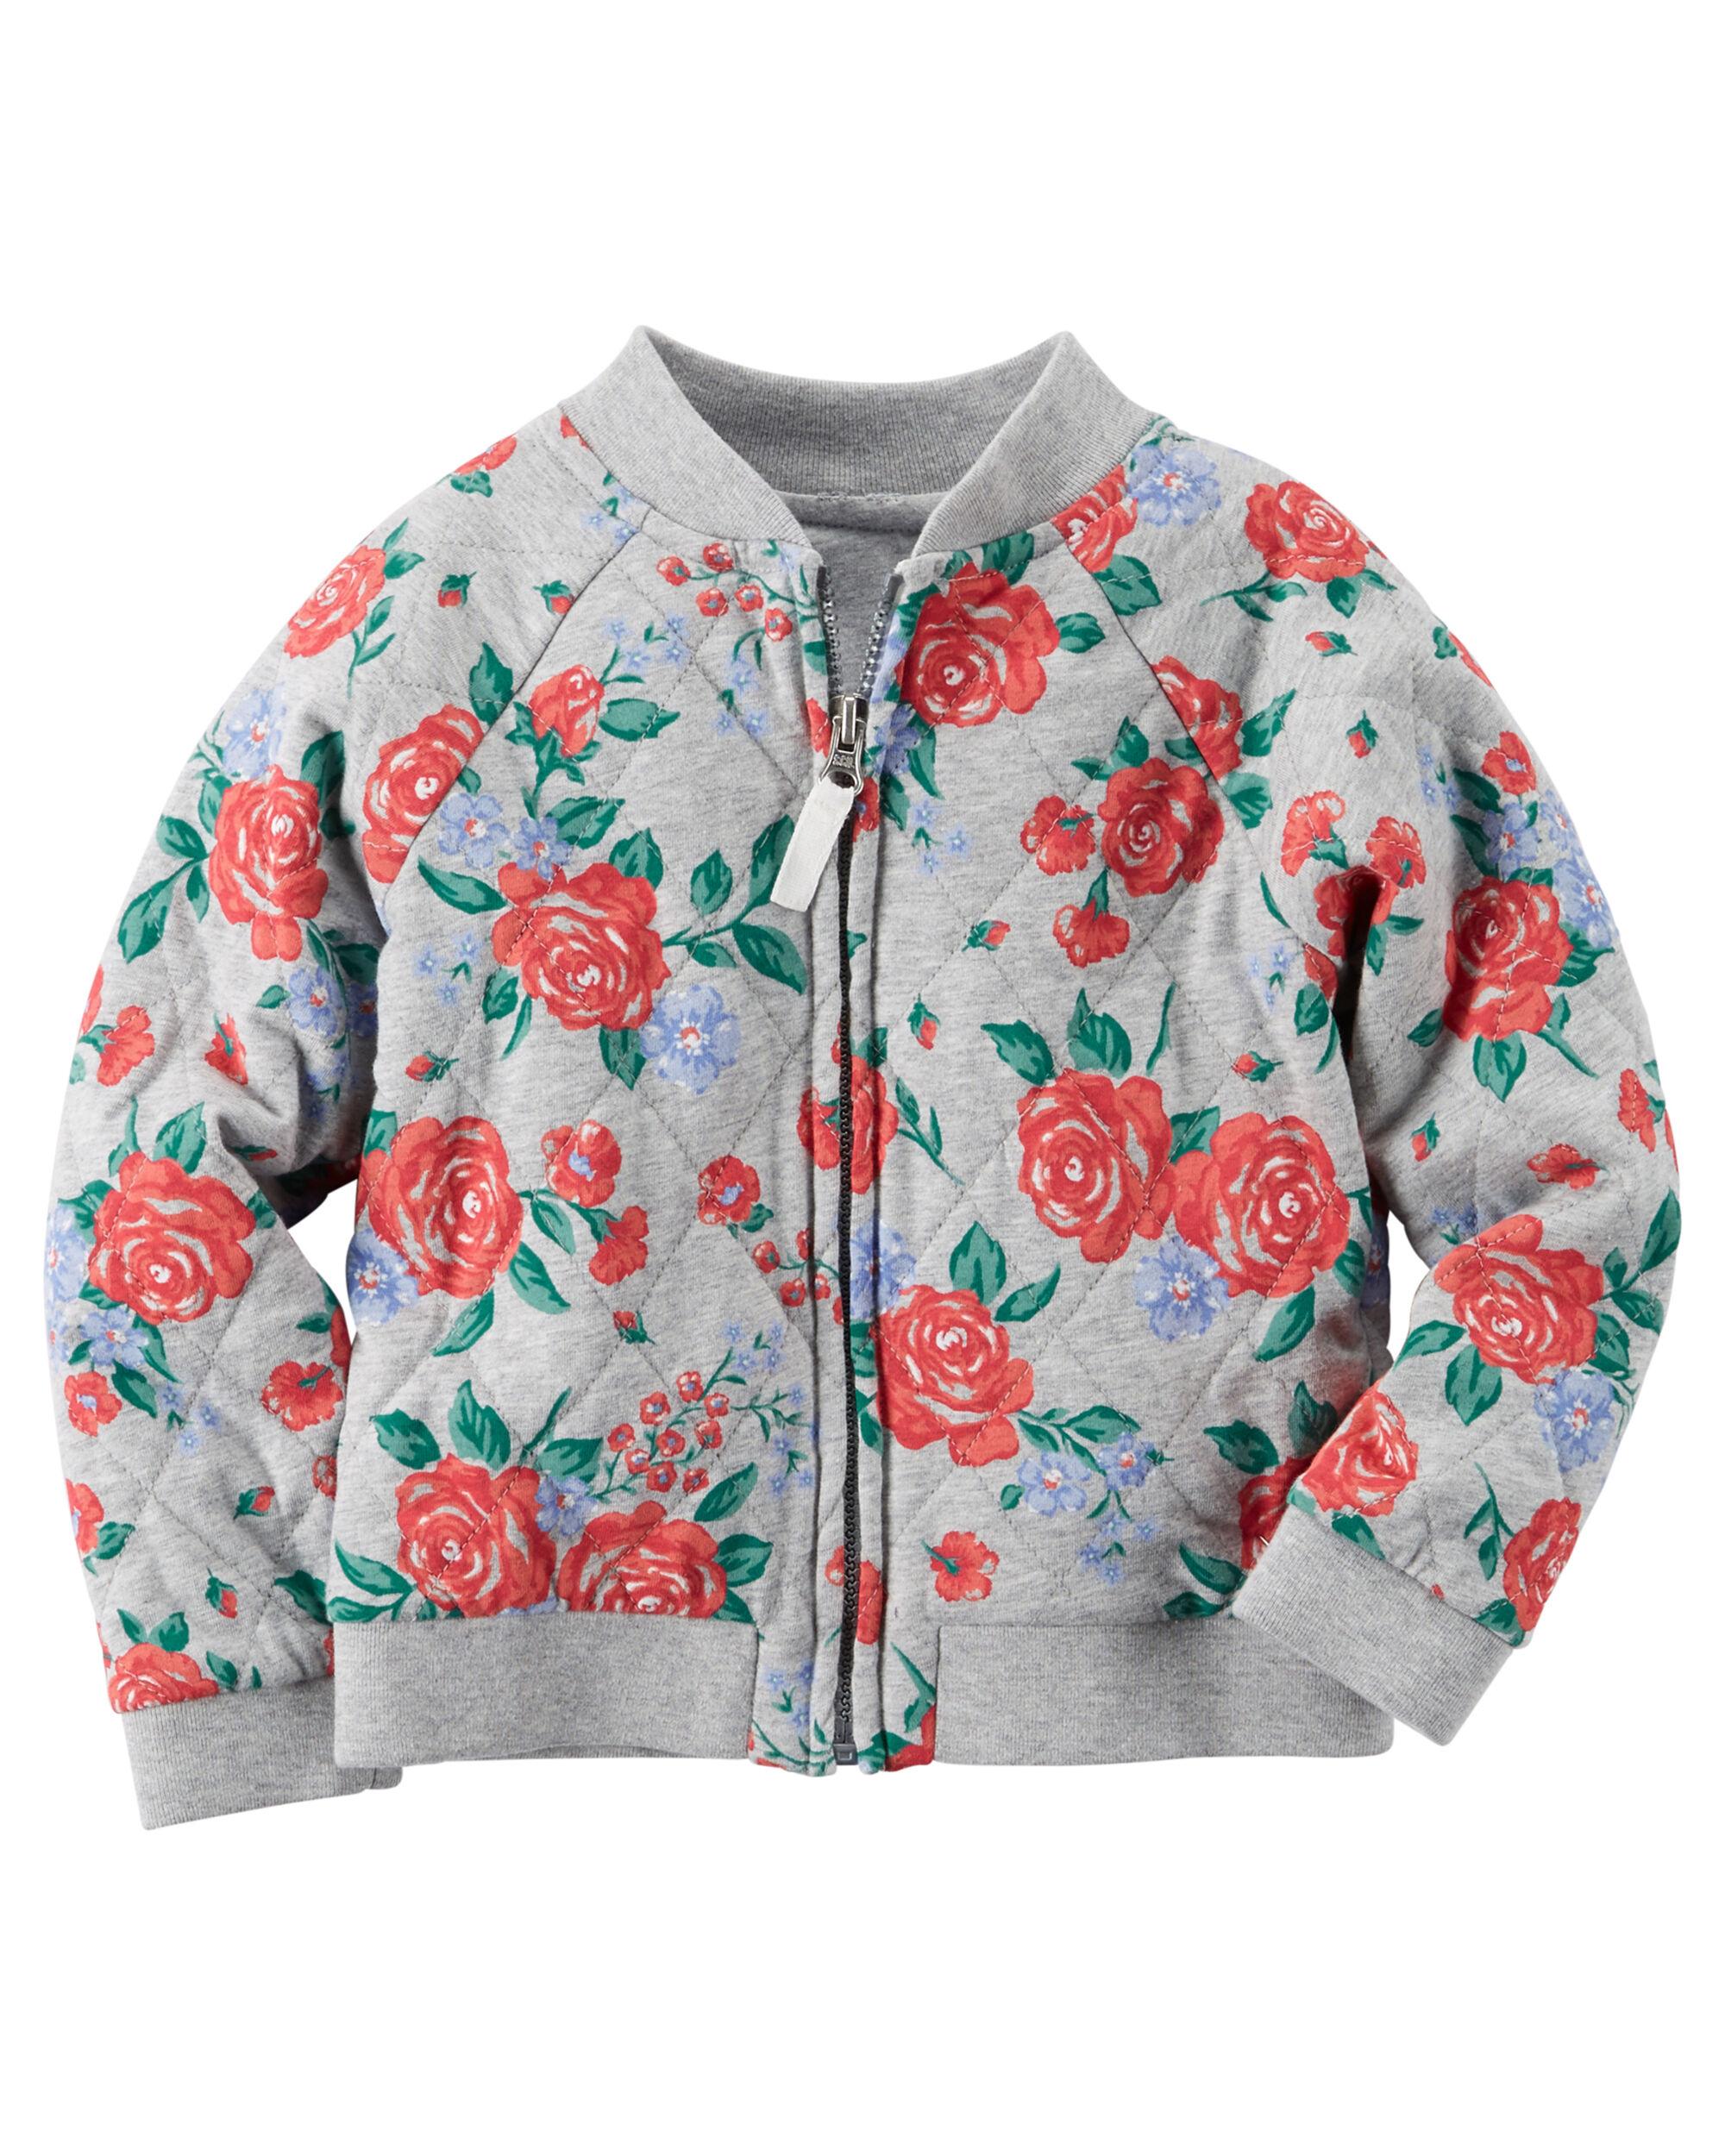 Toddler Girl Lightweight Quilted Floral Bomber Jacket | Carters.com